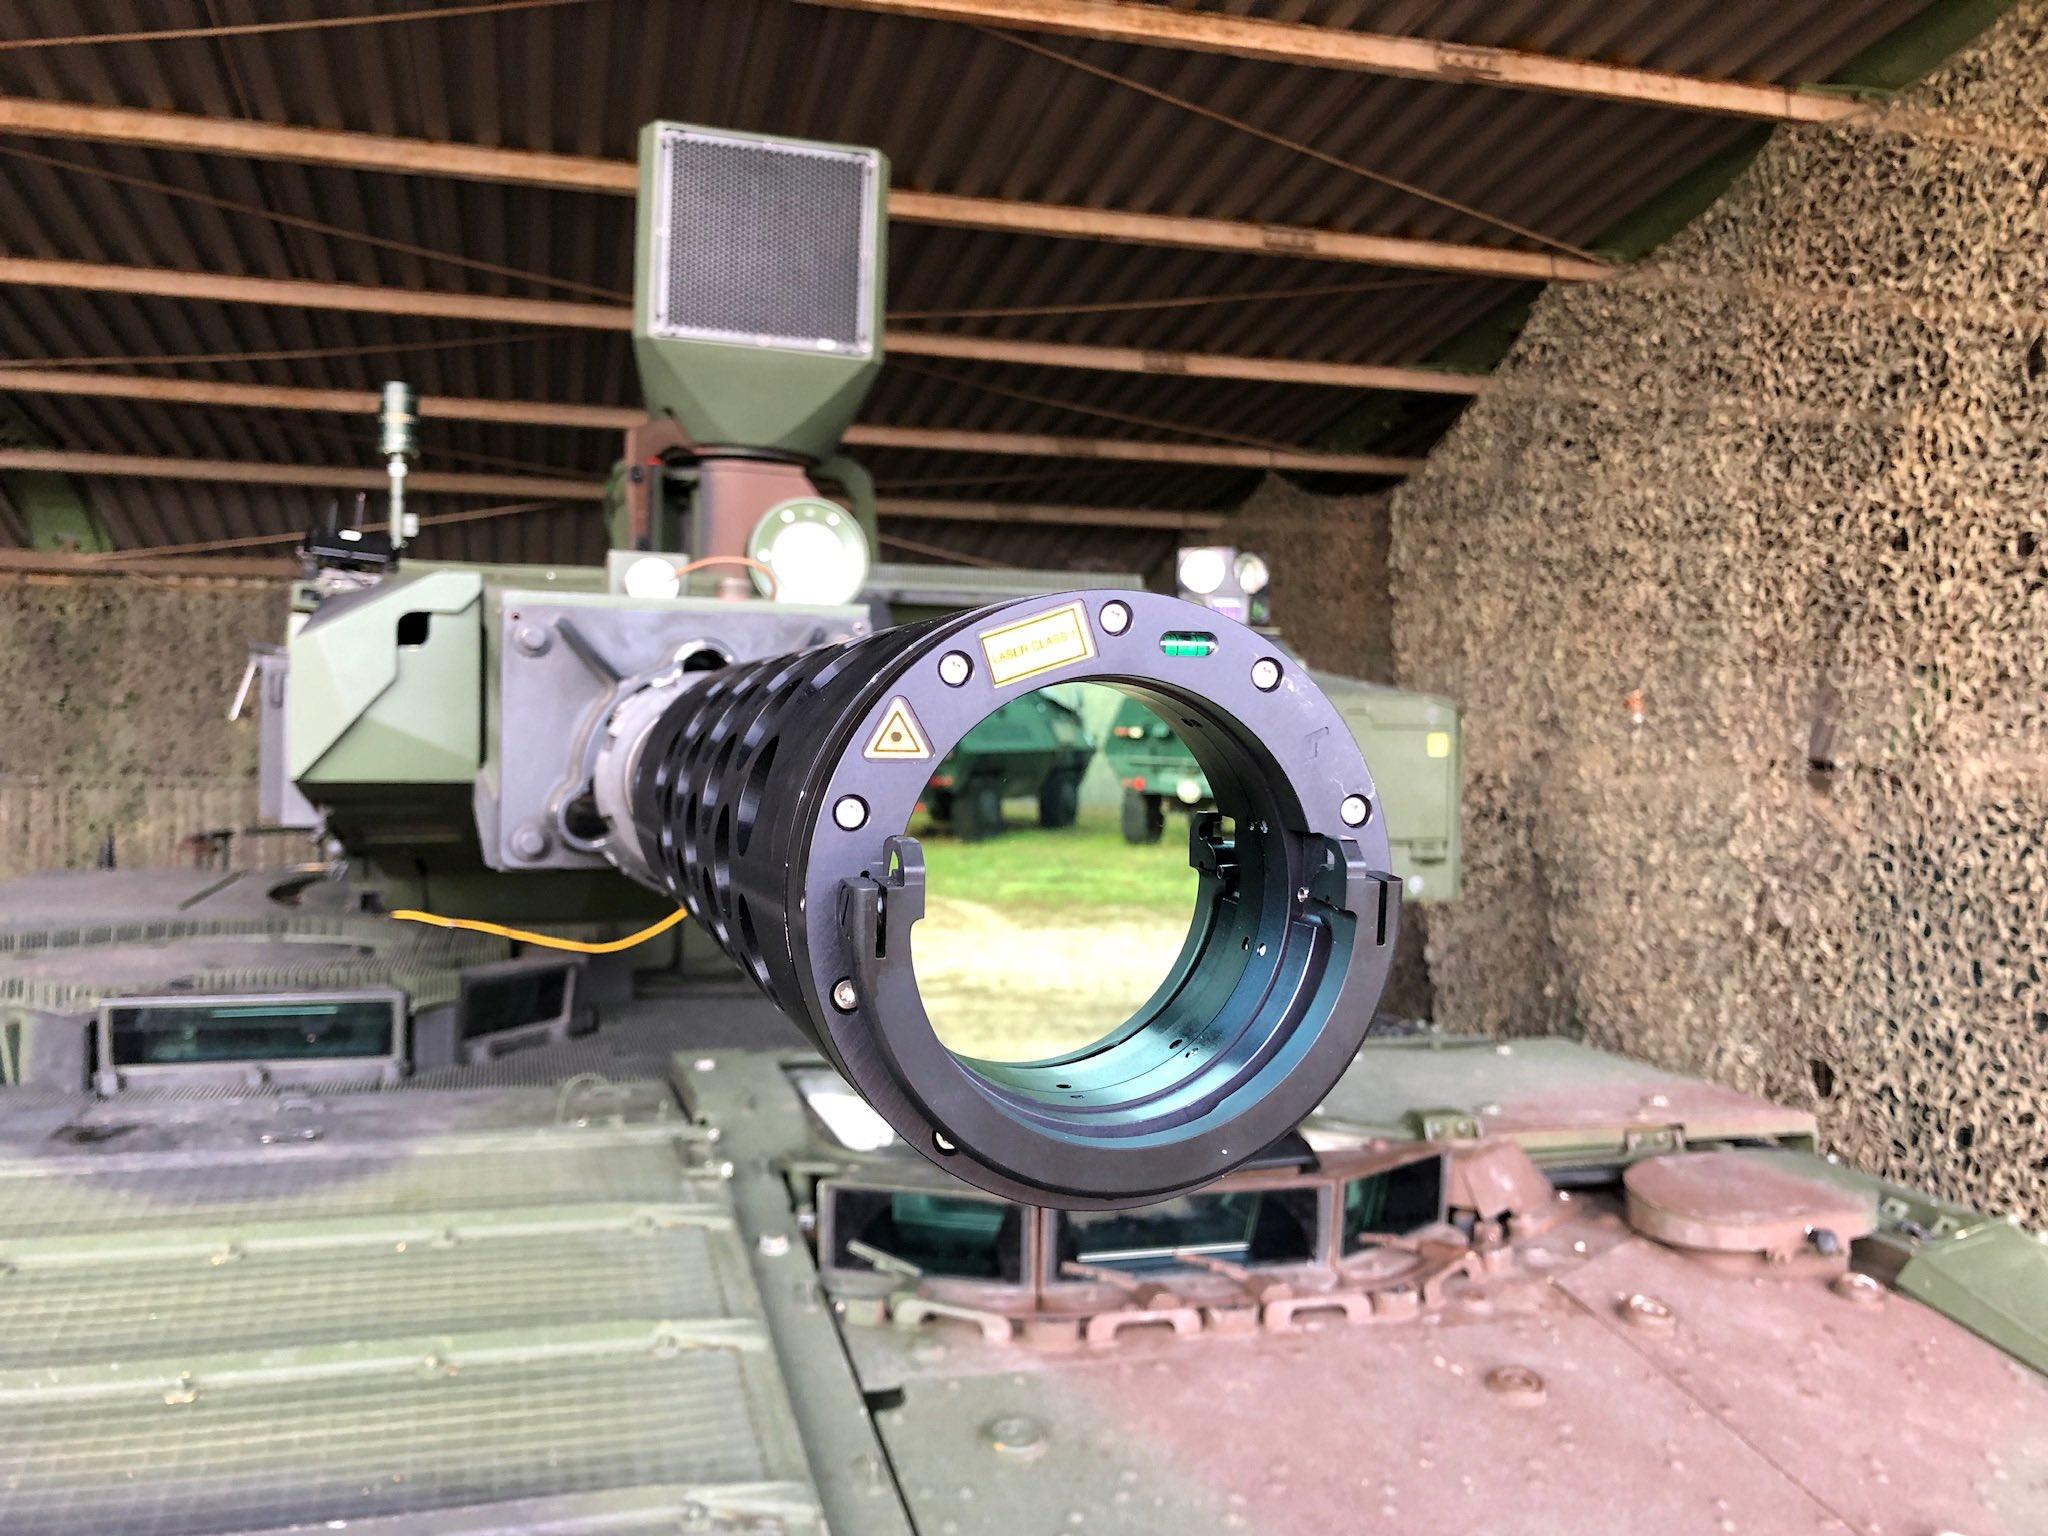 Rheinmetall to Supply Laser Duel Simulators for the Puma Infantry Fighting Vehicle